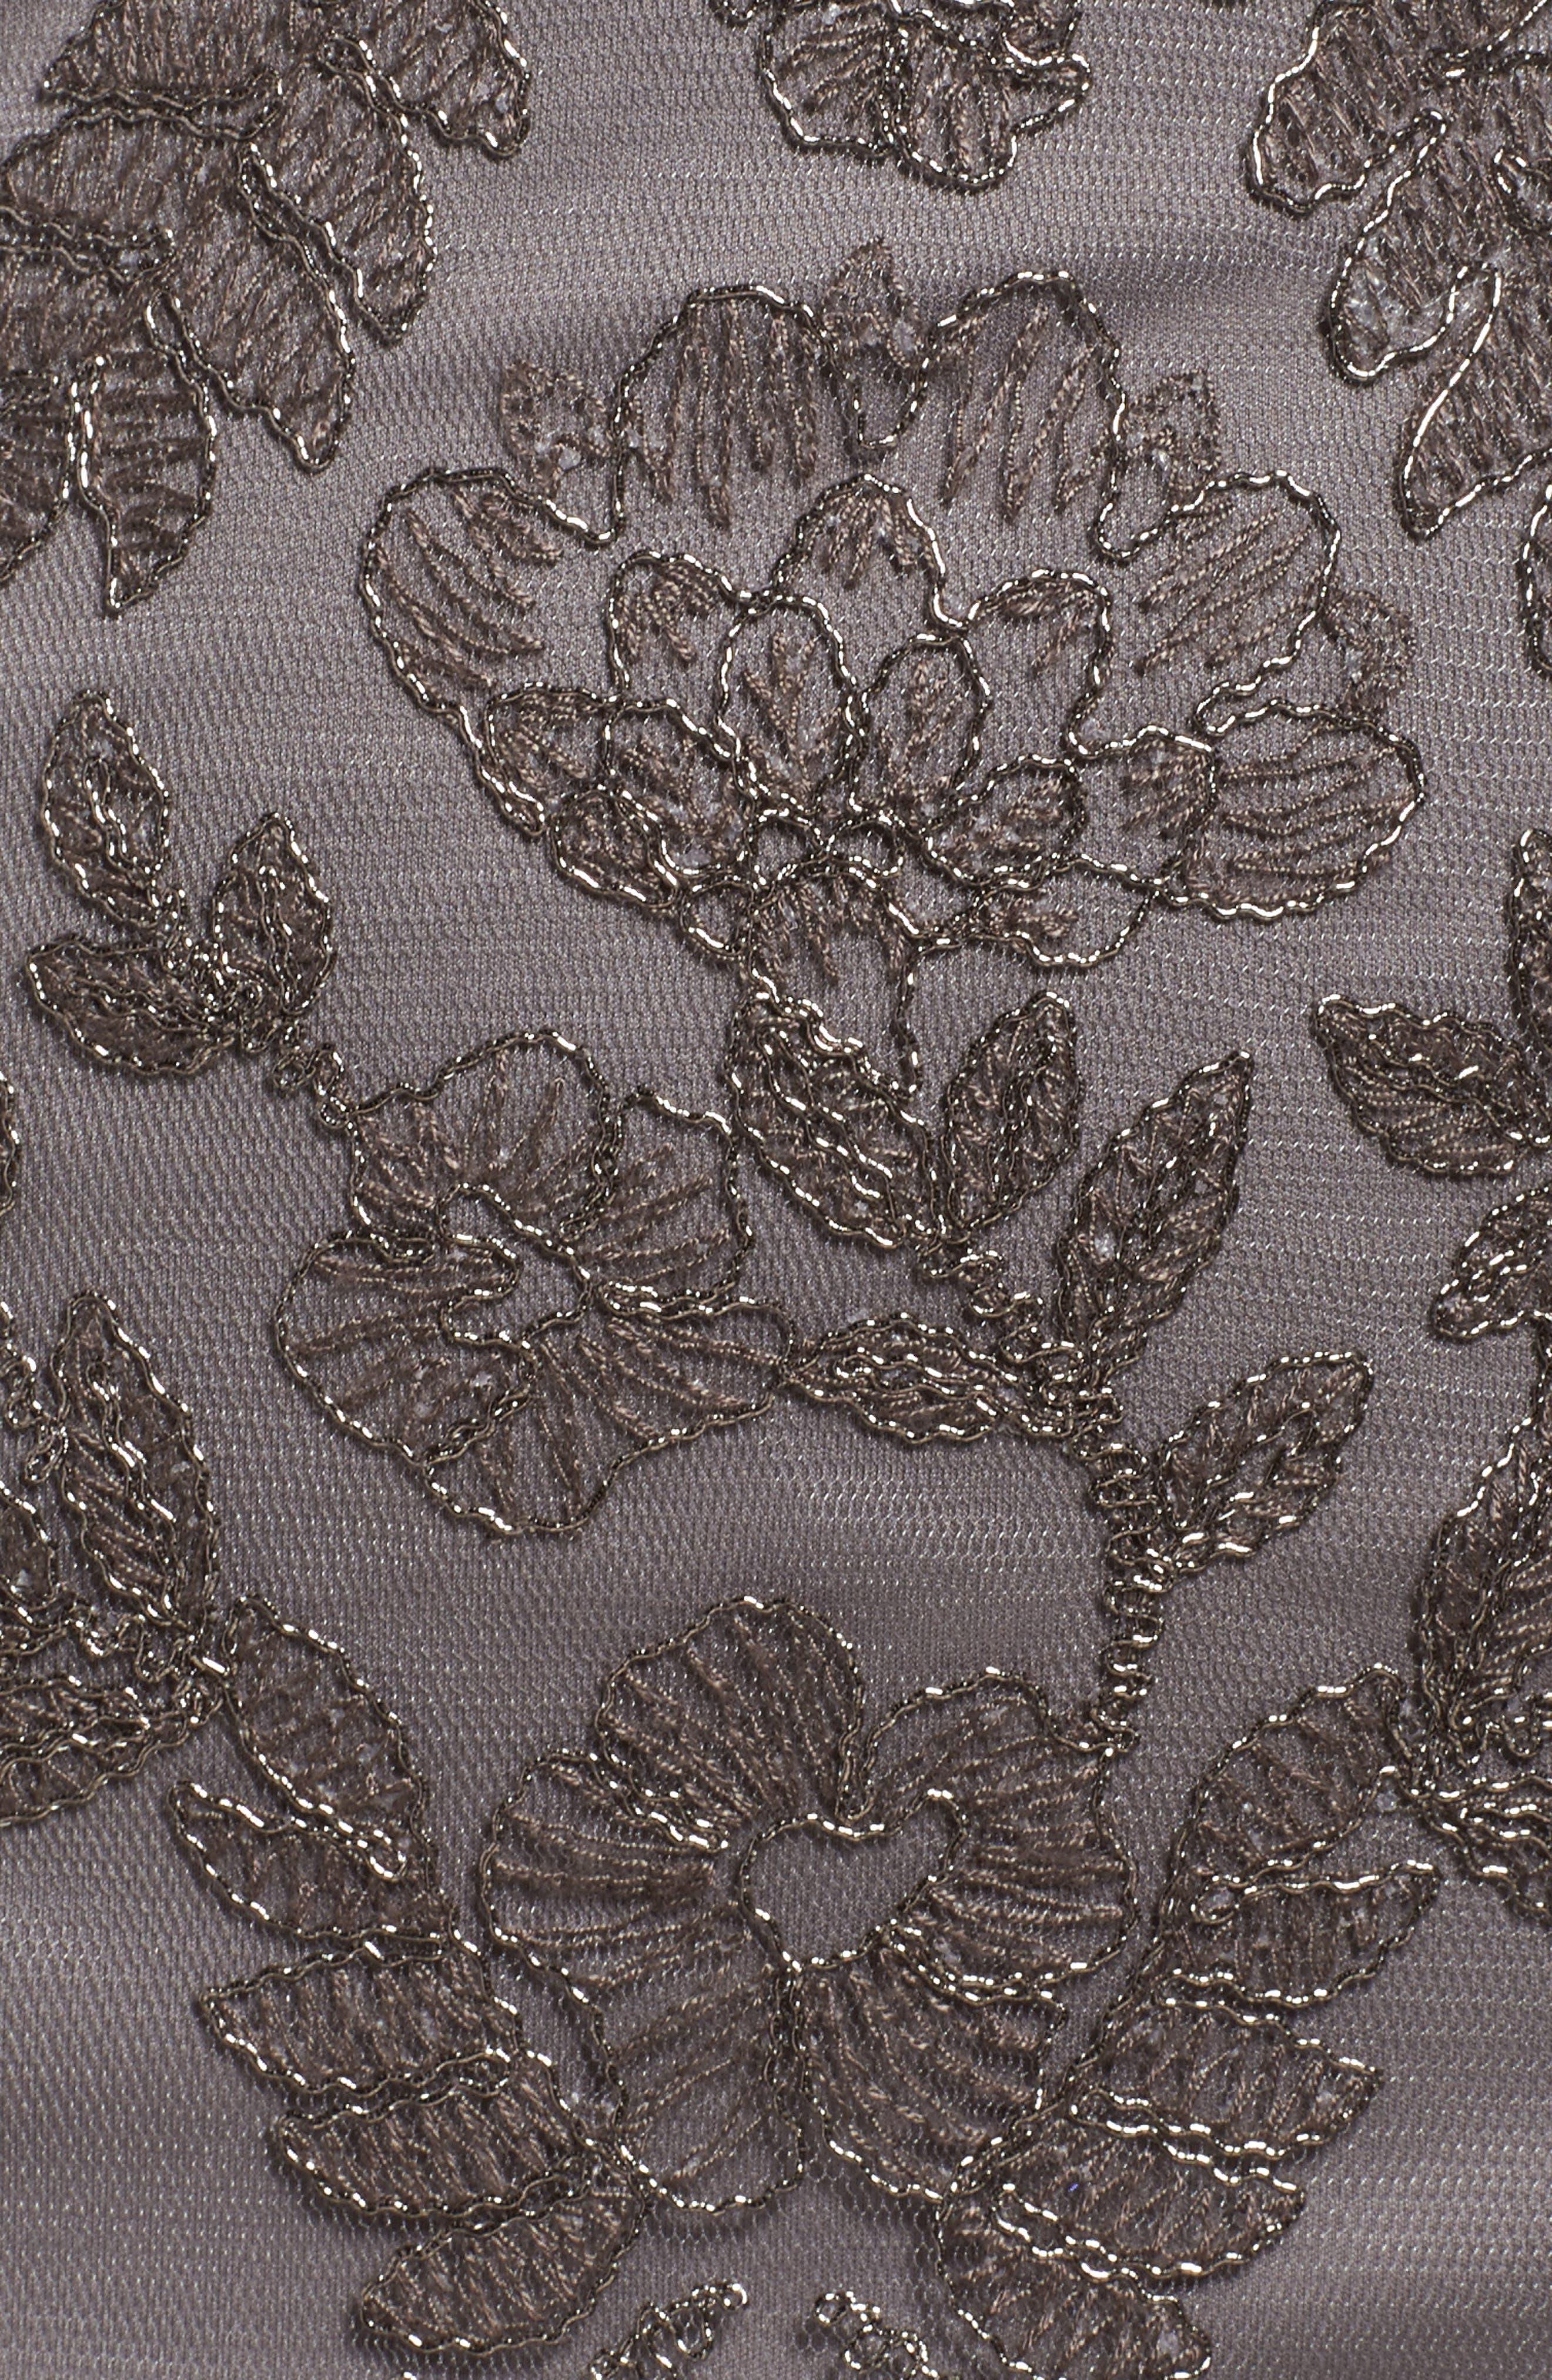 Lace Sheath Dress,                             Alternate thumbnail 5, color,                             020